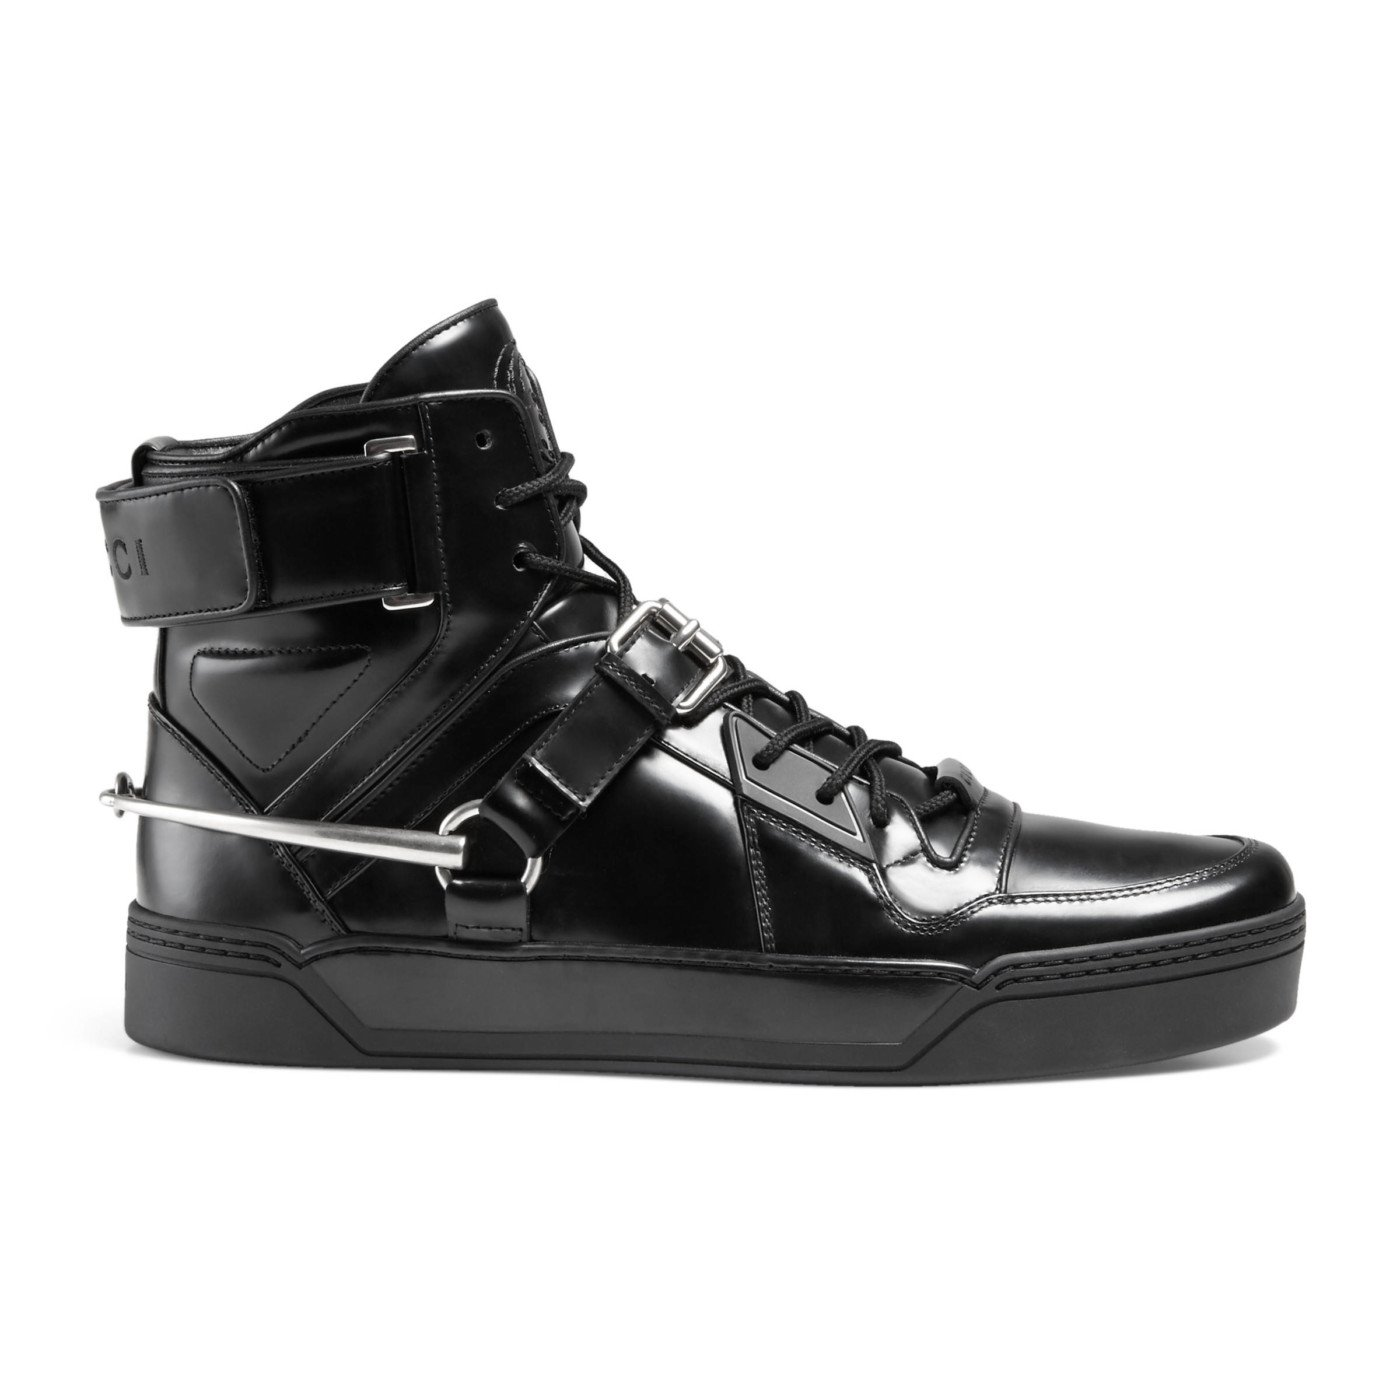 3a78318efec Top1  Gucci Men s Black Shiny Leather GG Horsebit High Top Sneakers Shoes